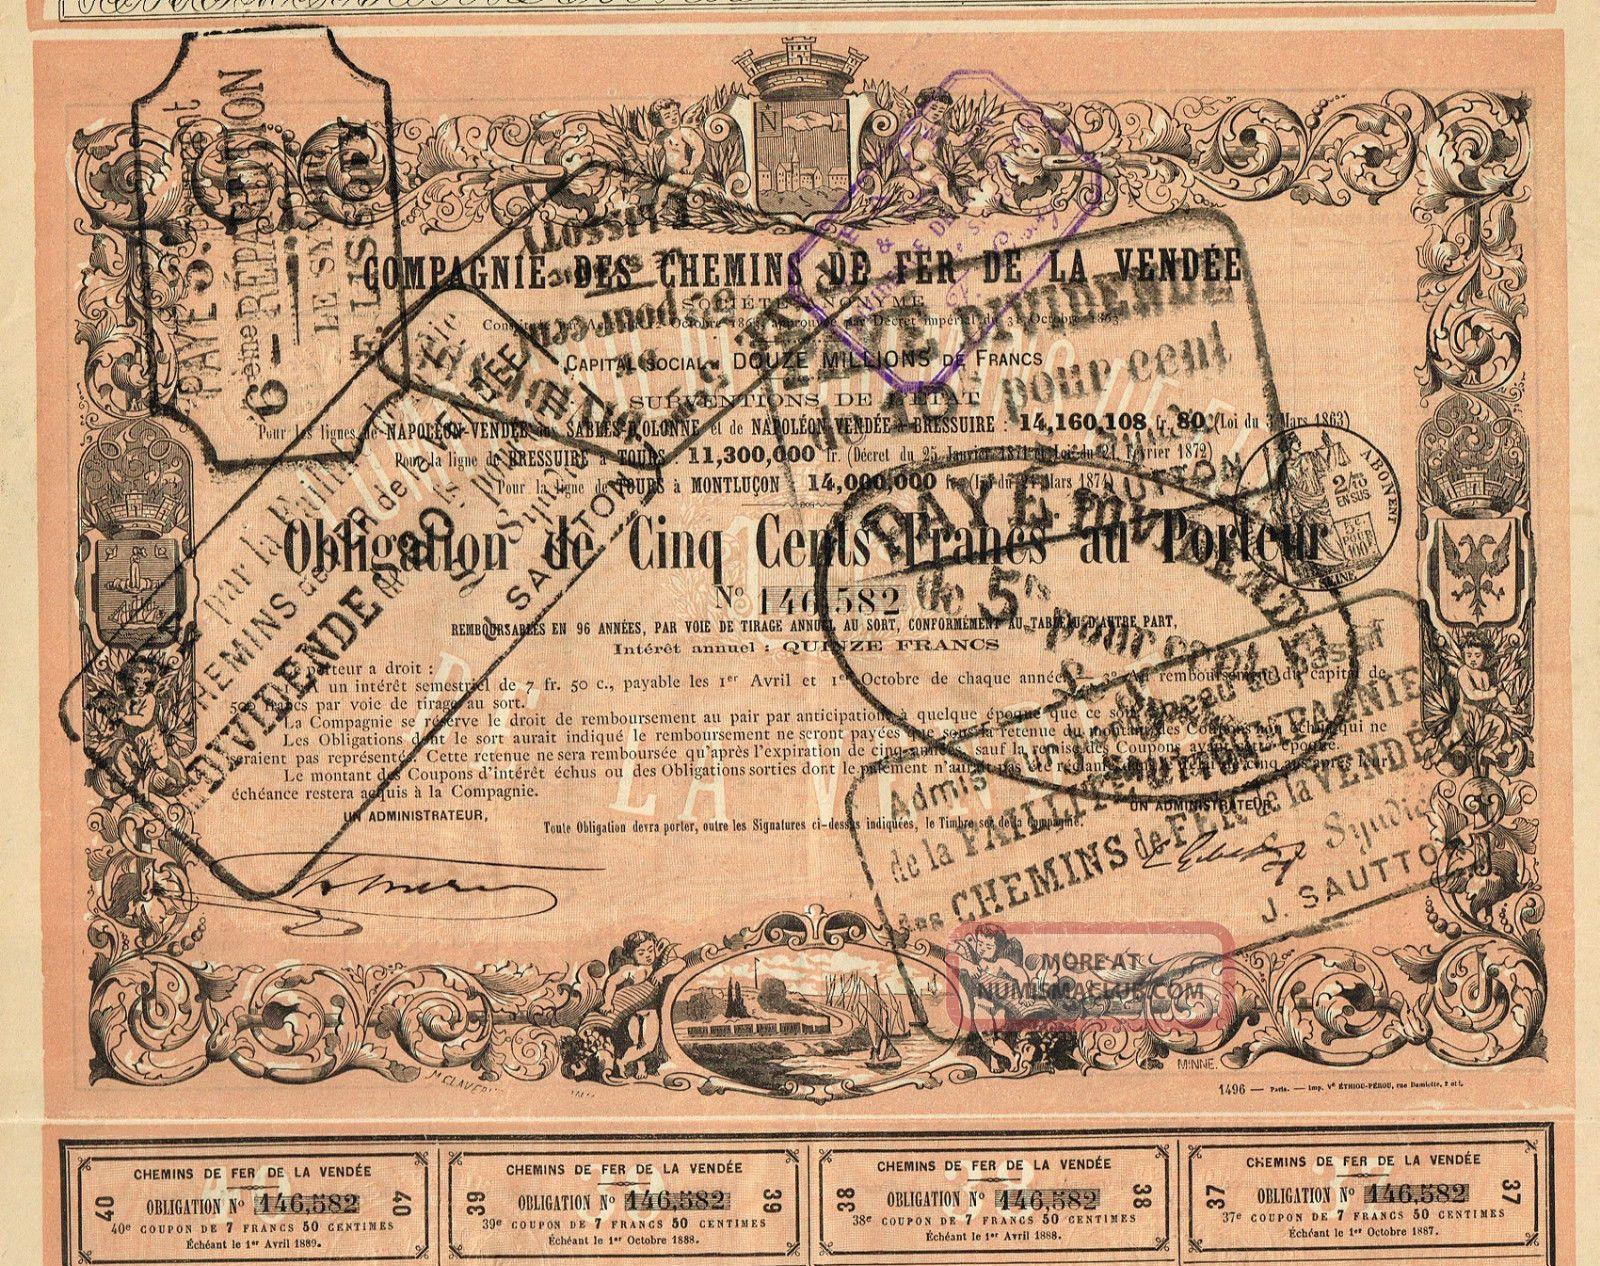 France Vendee Railway Stock Certificate 1863 World photo